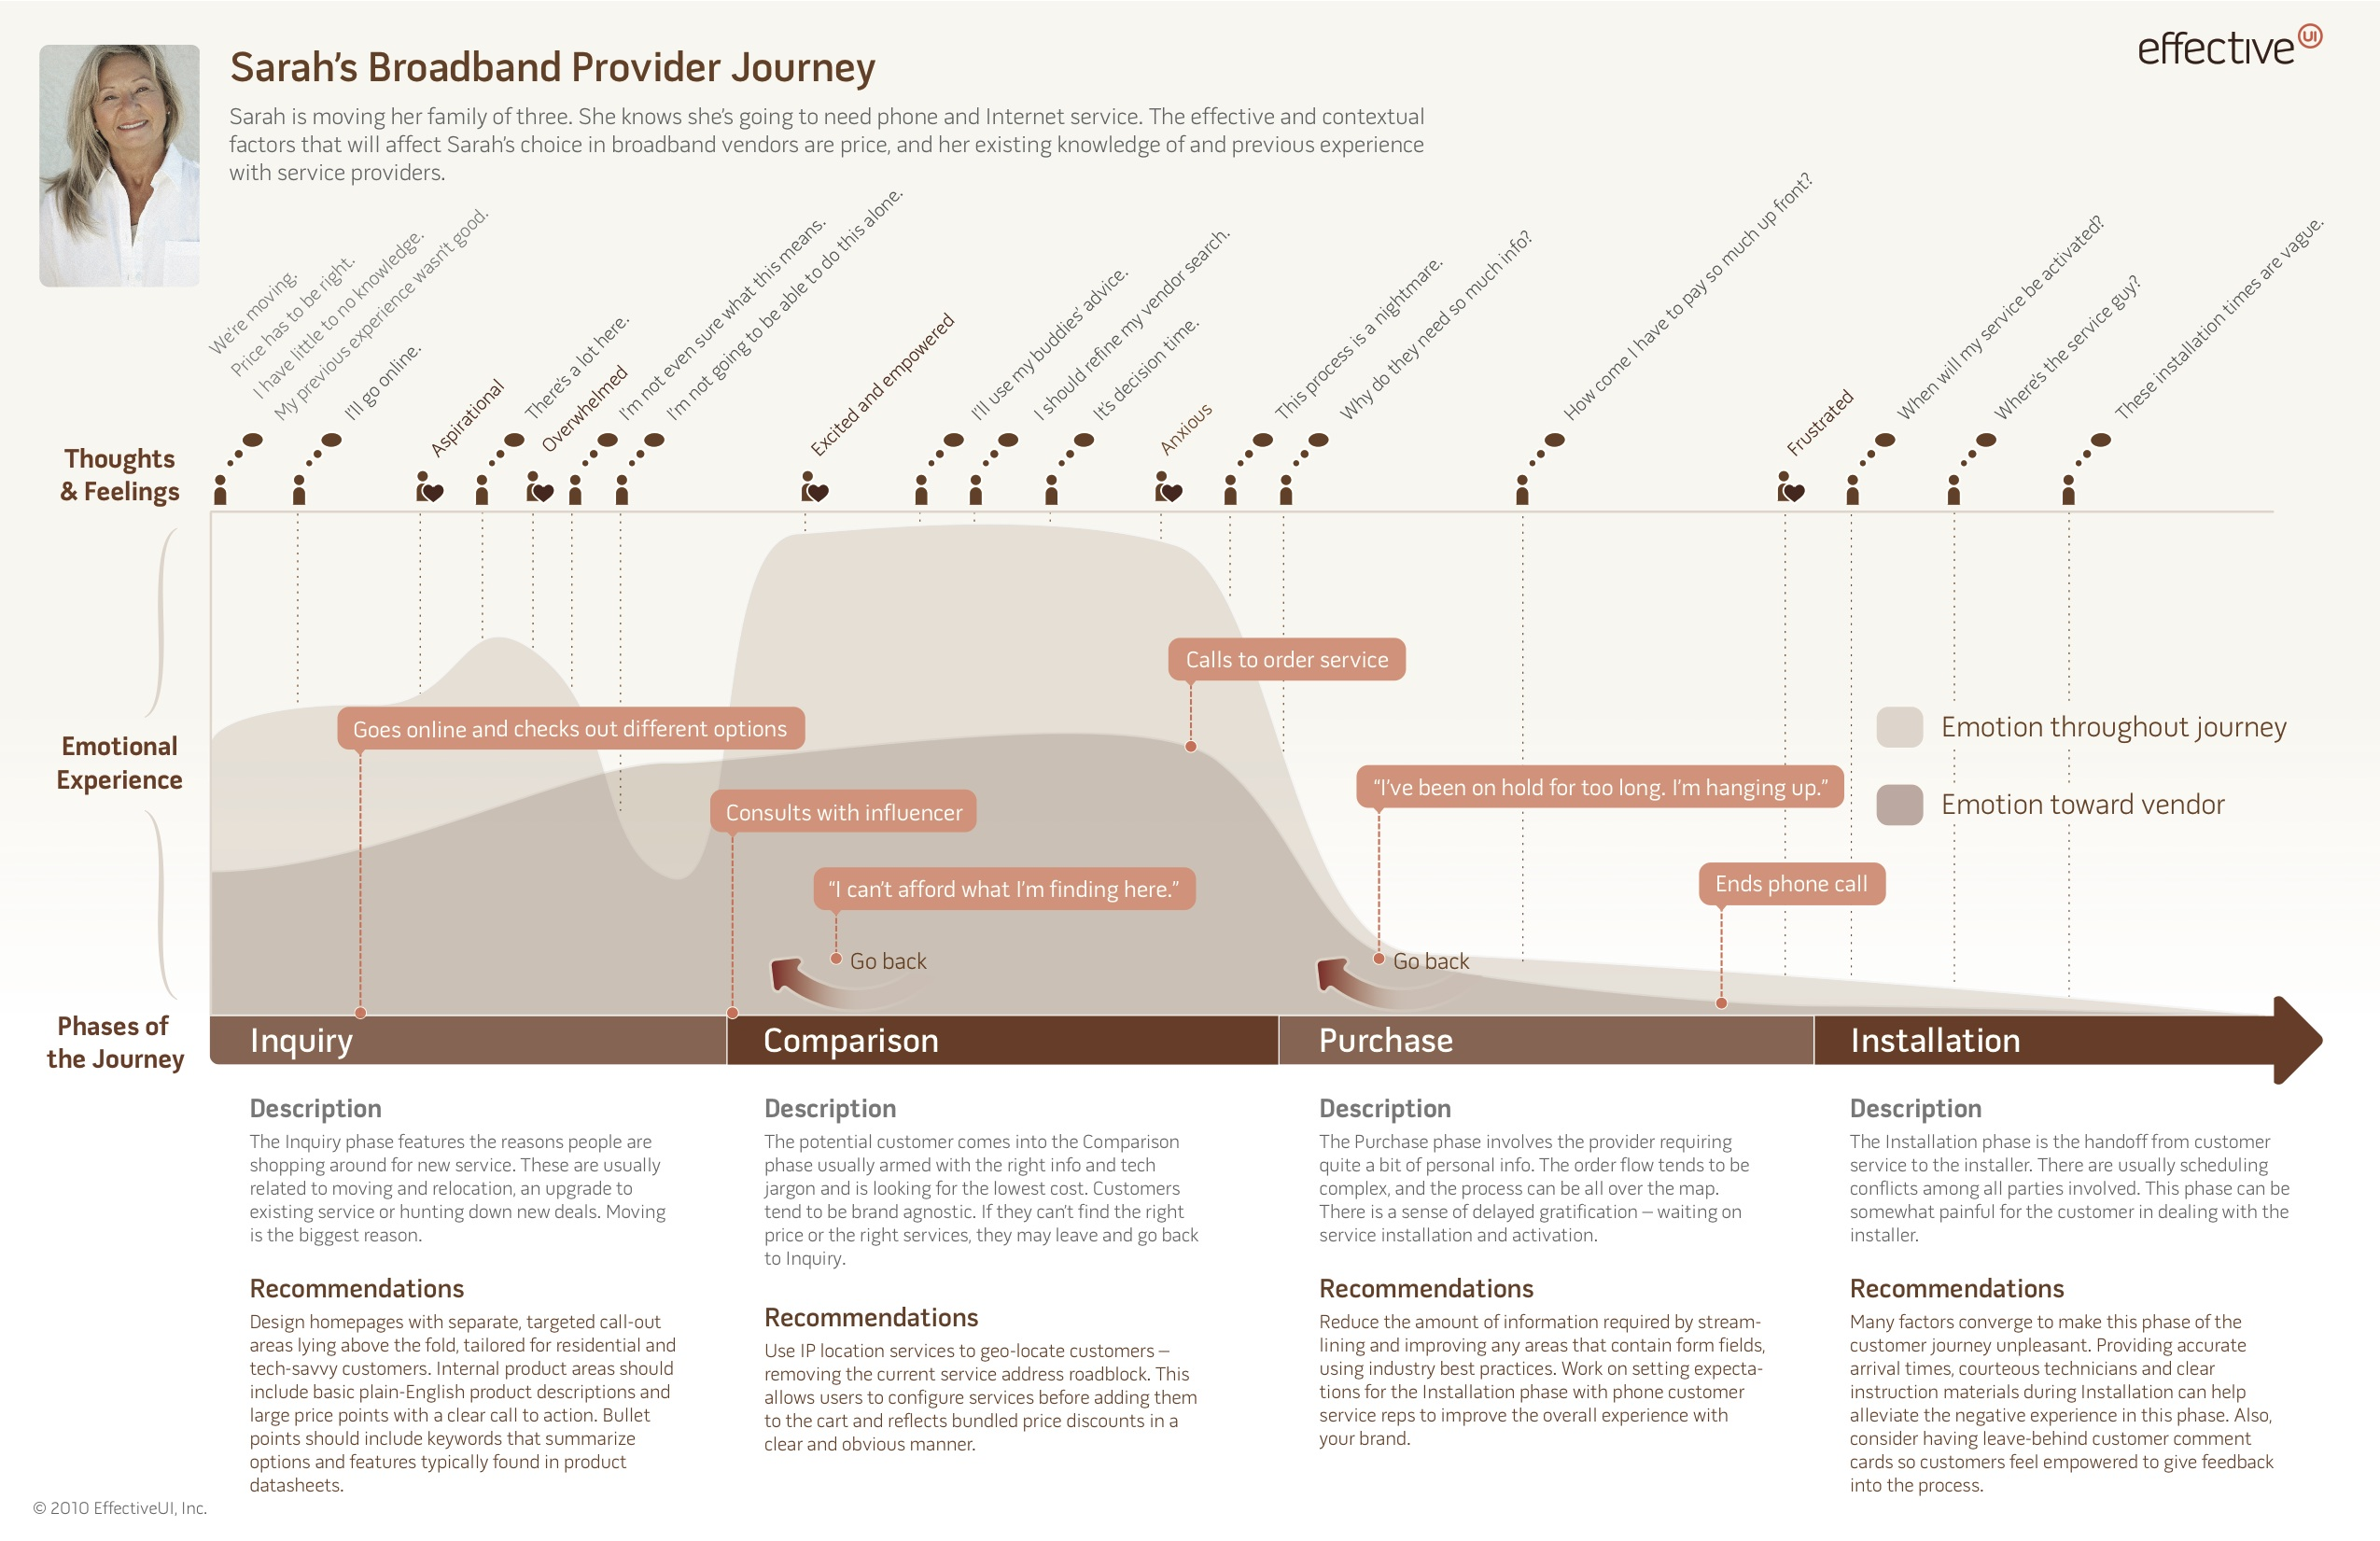 customer-journey-map-4.jpg